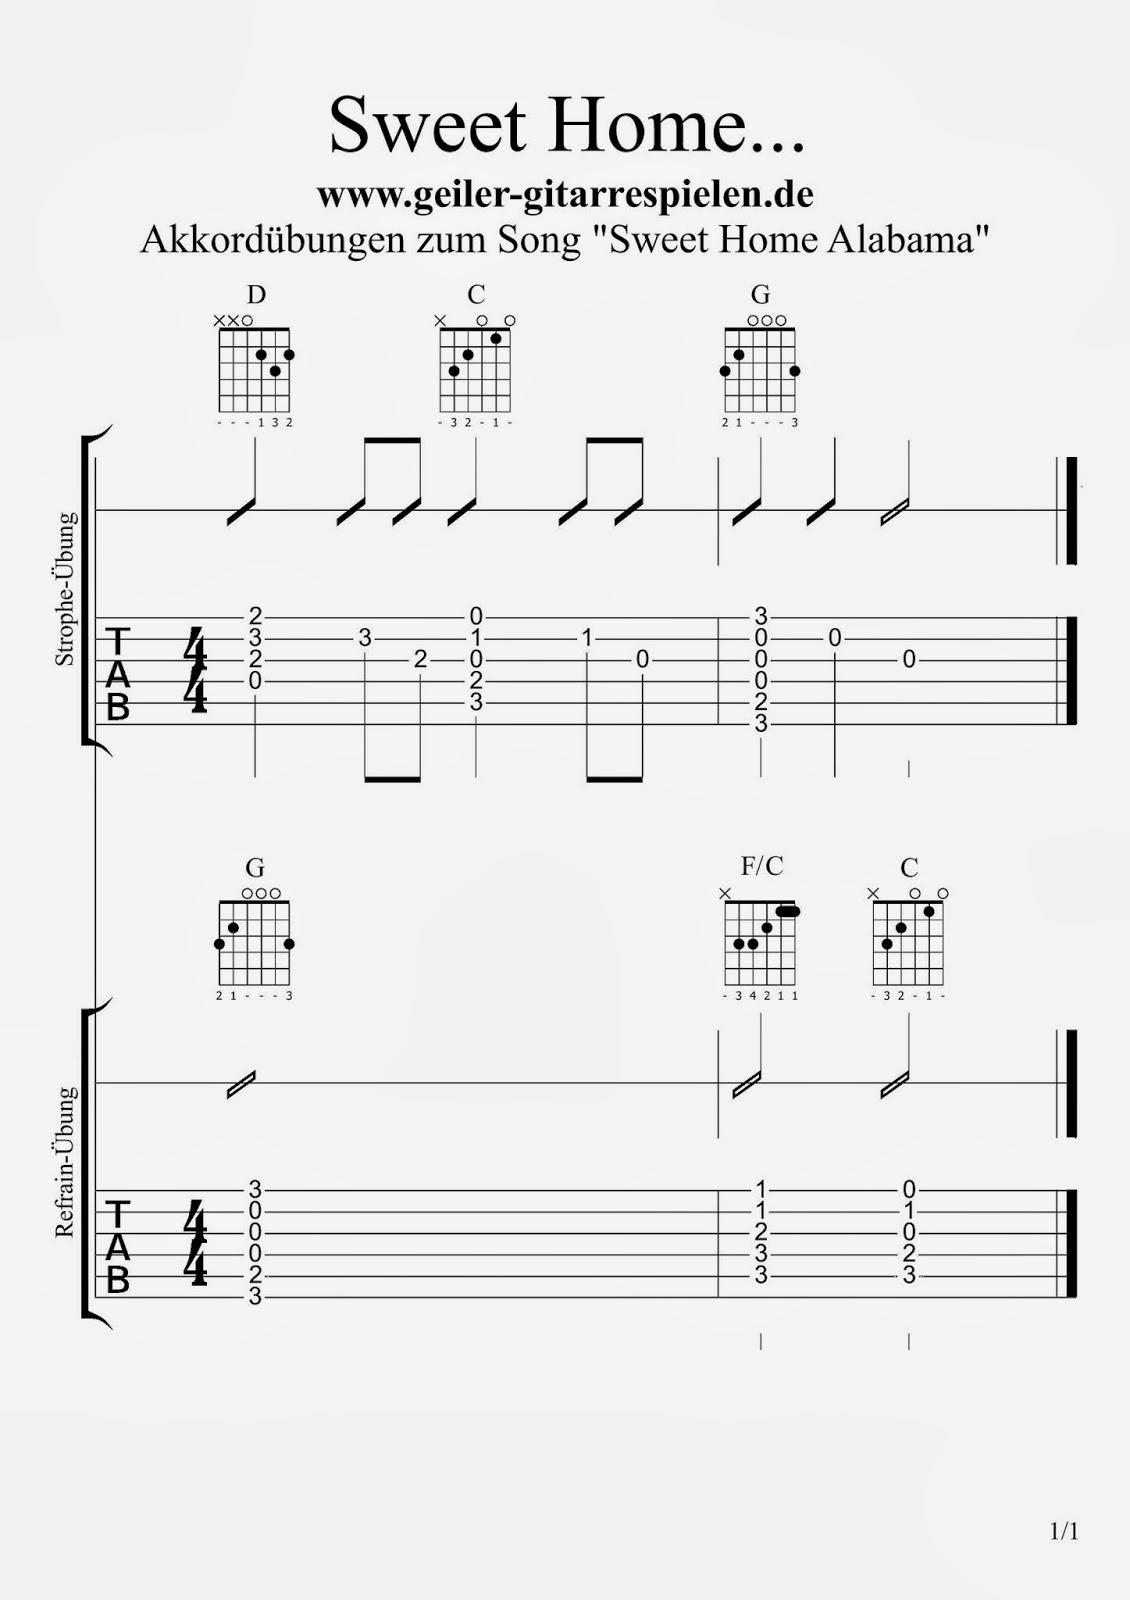 Die Gitarren Seite Sweet Home Alabama – Akkorde